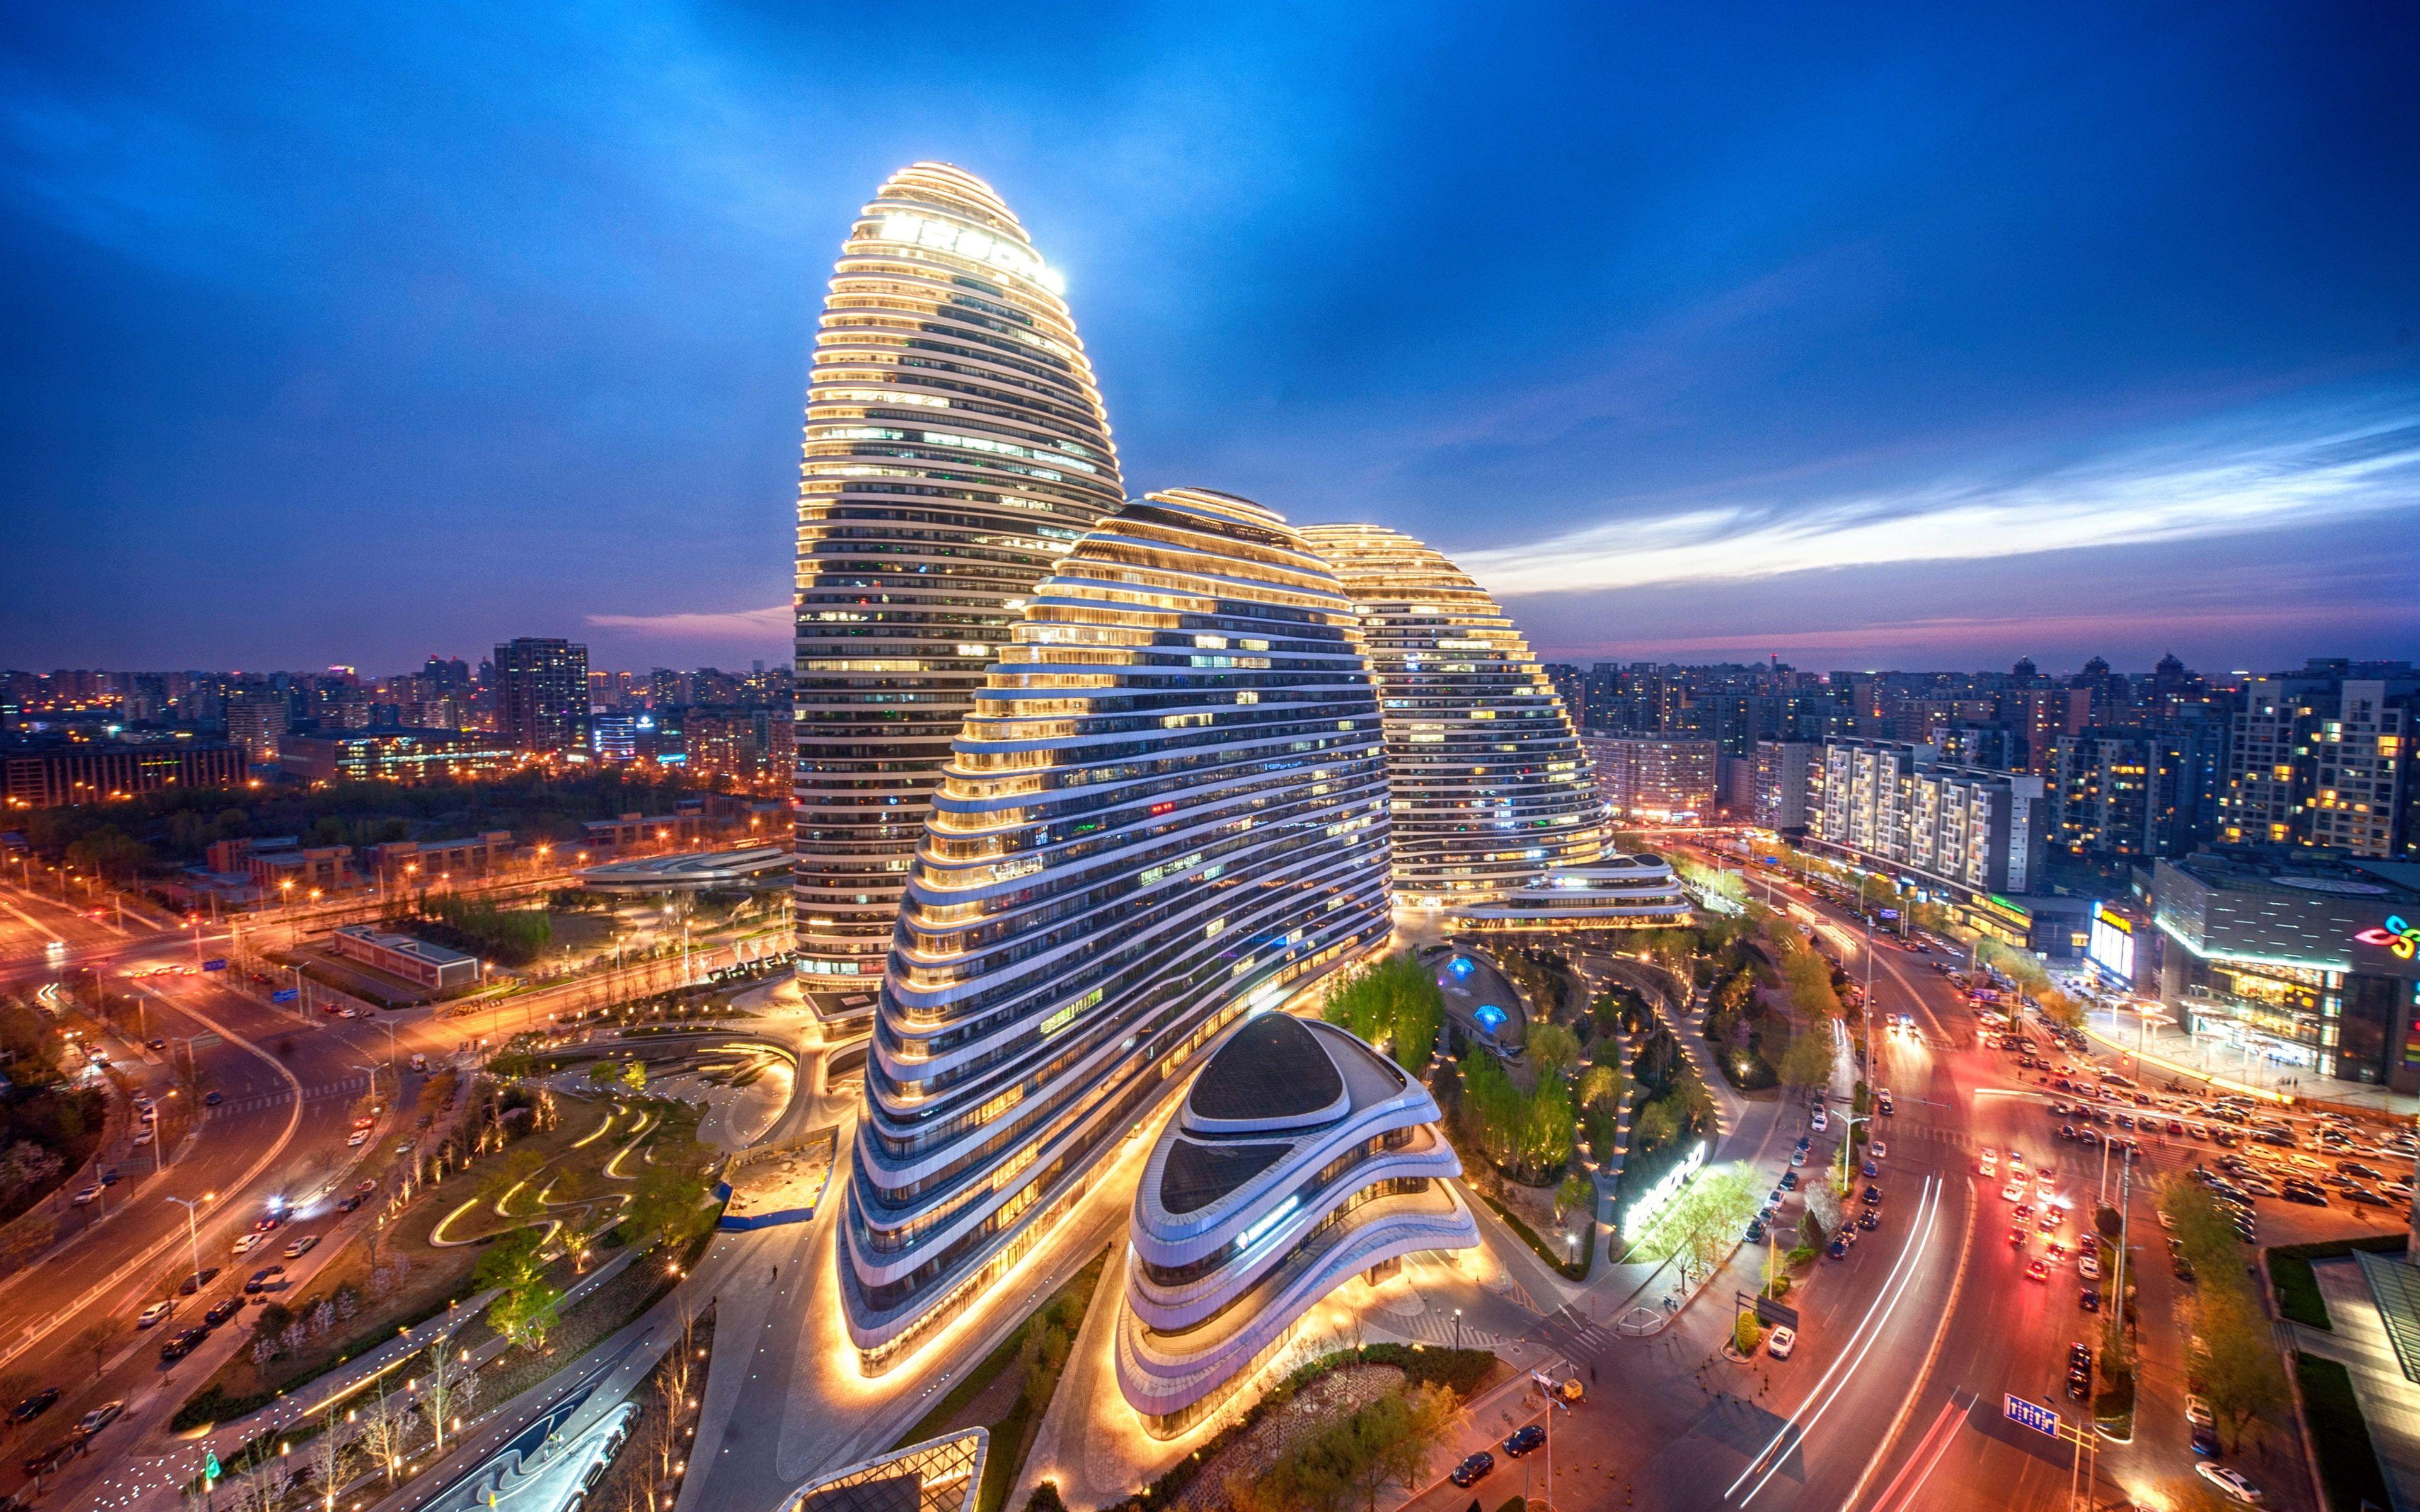 Beijing China CBD Creative Building Wangjing SOHO #4K #wallpaper # hdwallpaper #desktop in 2020 | Beijing, Beijing city, City architecture